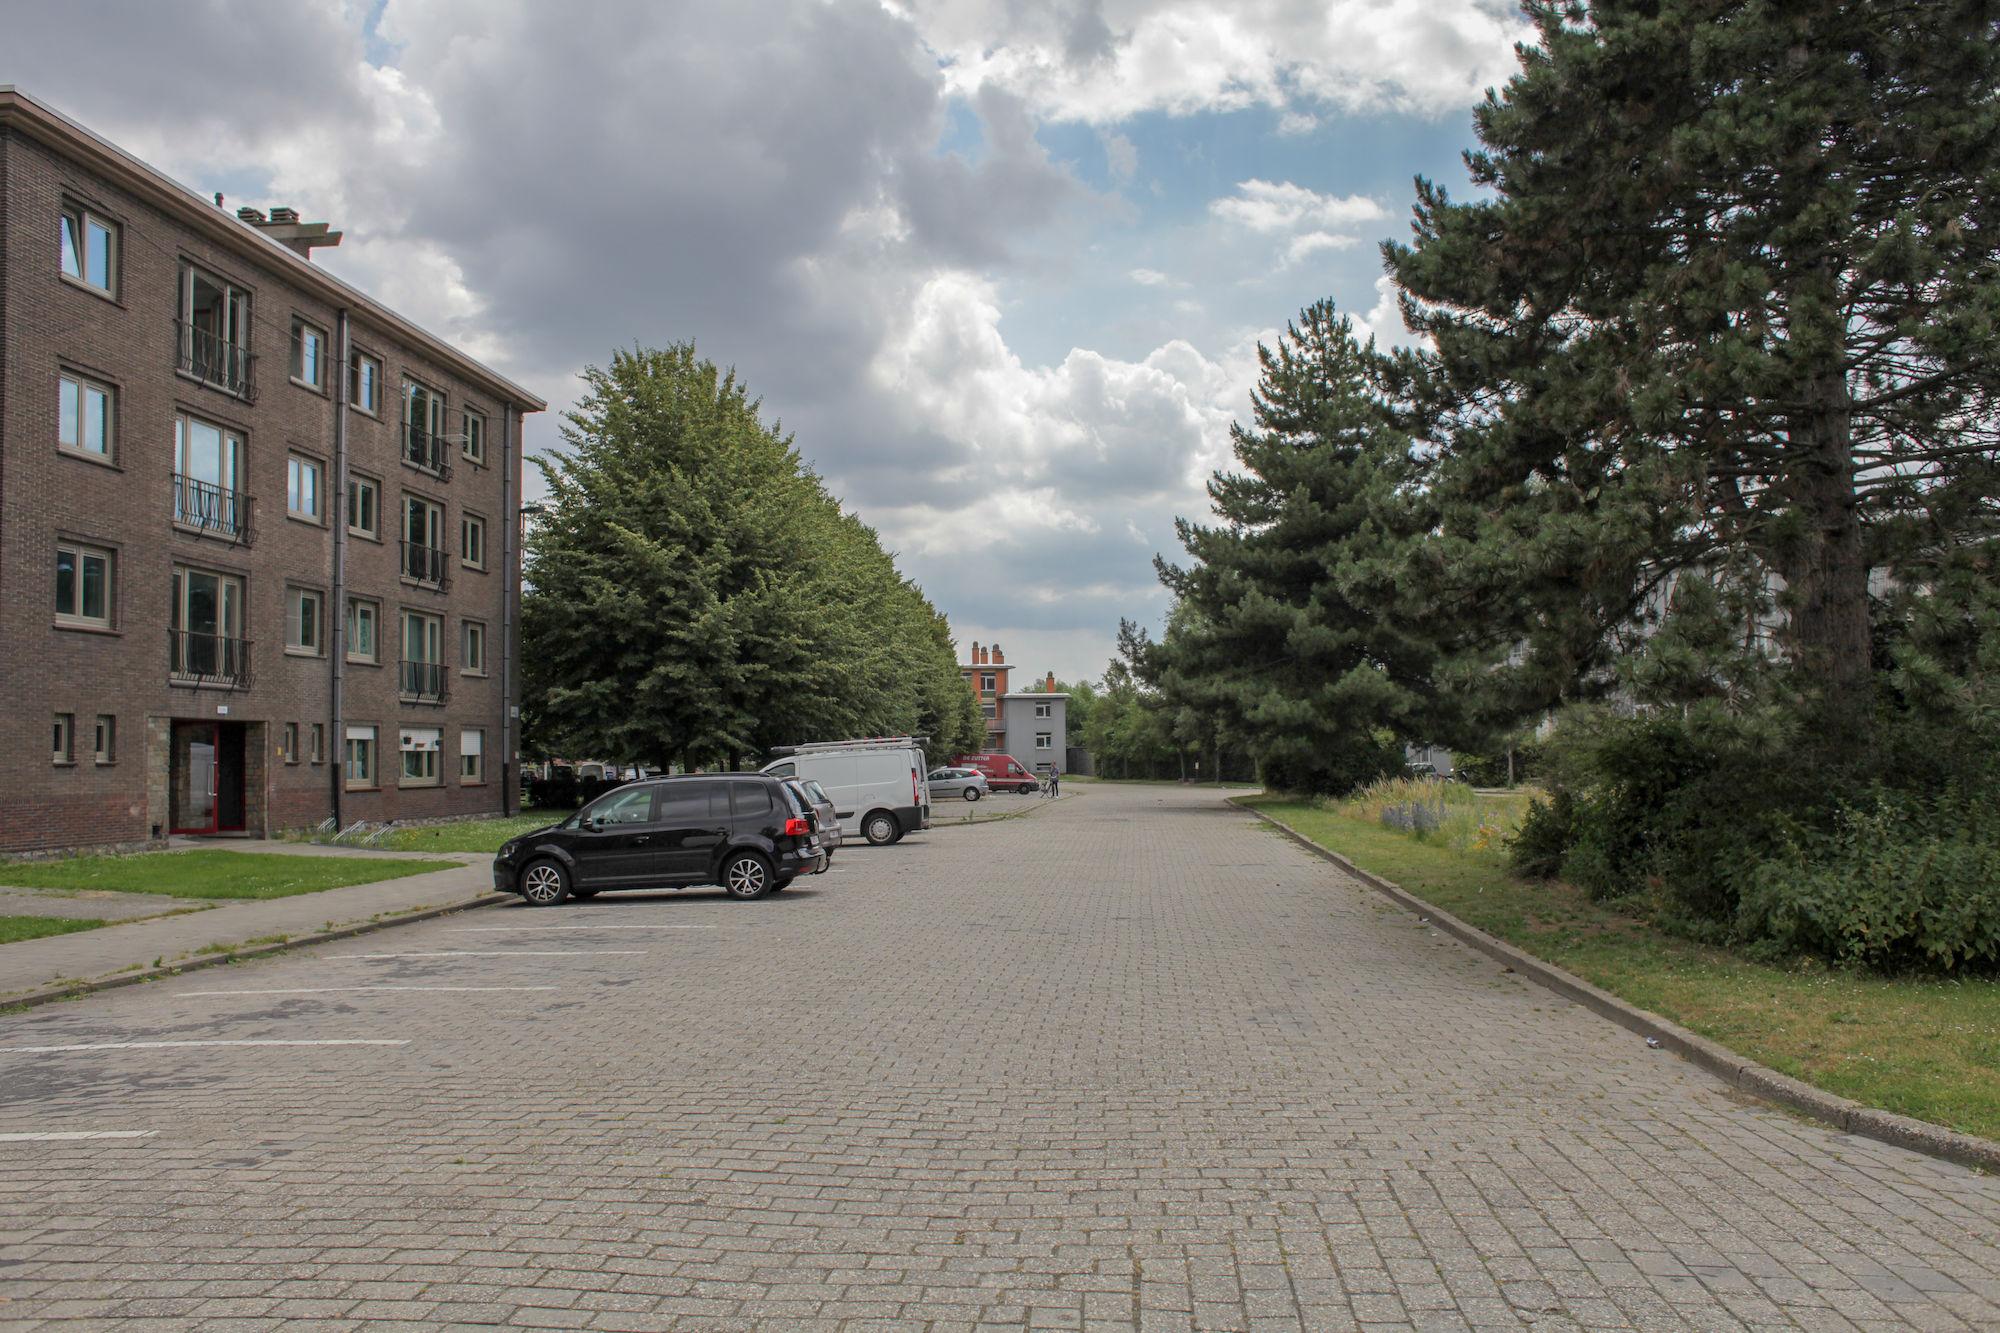 2019-07-02 Muide Meulestede prospectie Wannes_stadsvernieuwing_IMG_0356-2.jpg